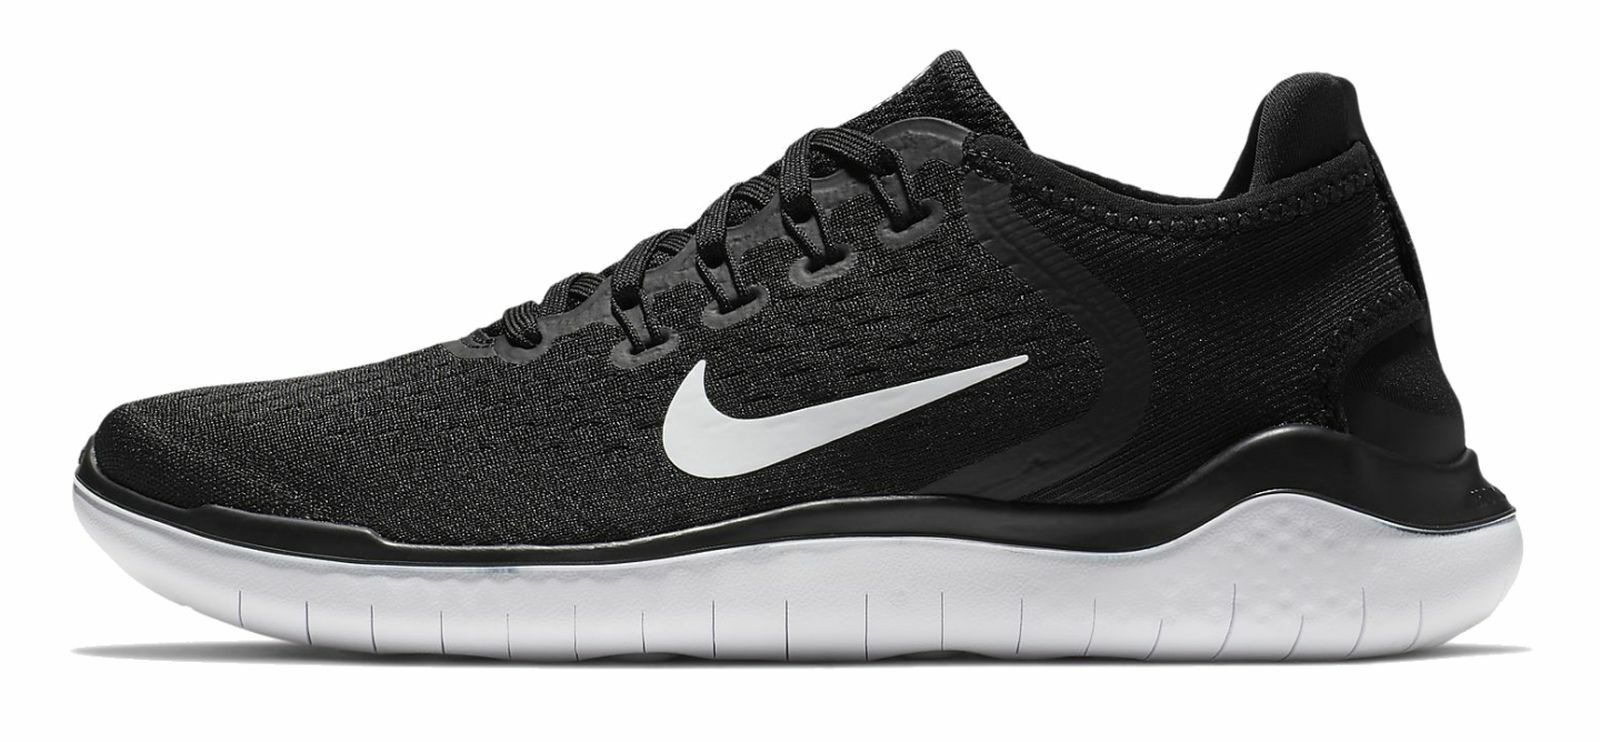 Nike señora rn mentecato wmns Nike Free rn señora 2018 negro  blanco o 06e5b5